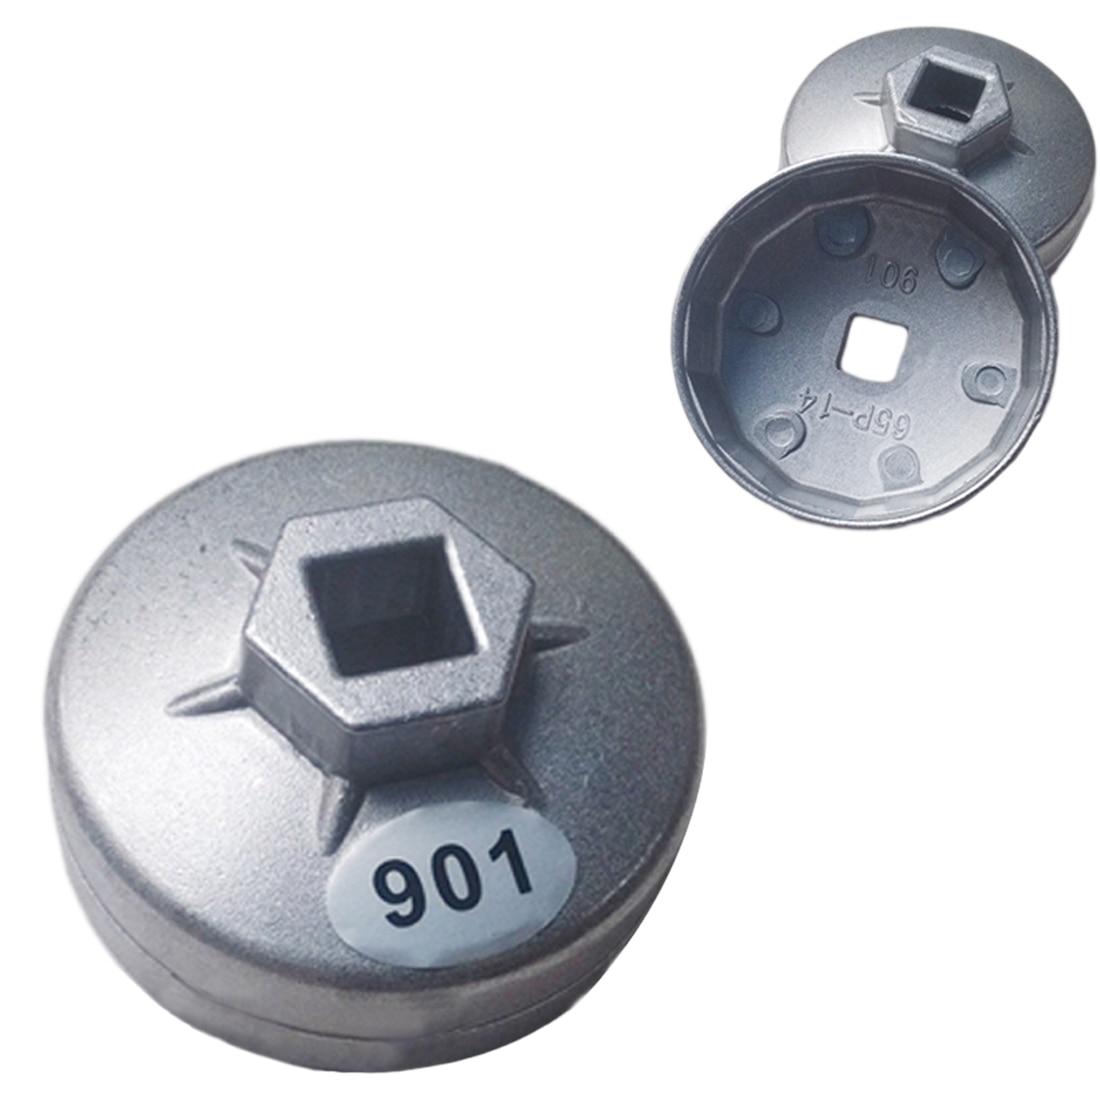 "901 Cap Oliefiltersleutel 1/2 ""Vierkante Drive Olie Filter Removel Gereedschap Filter Dopsleutel Spanner Handje"